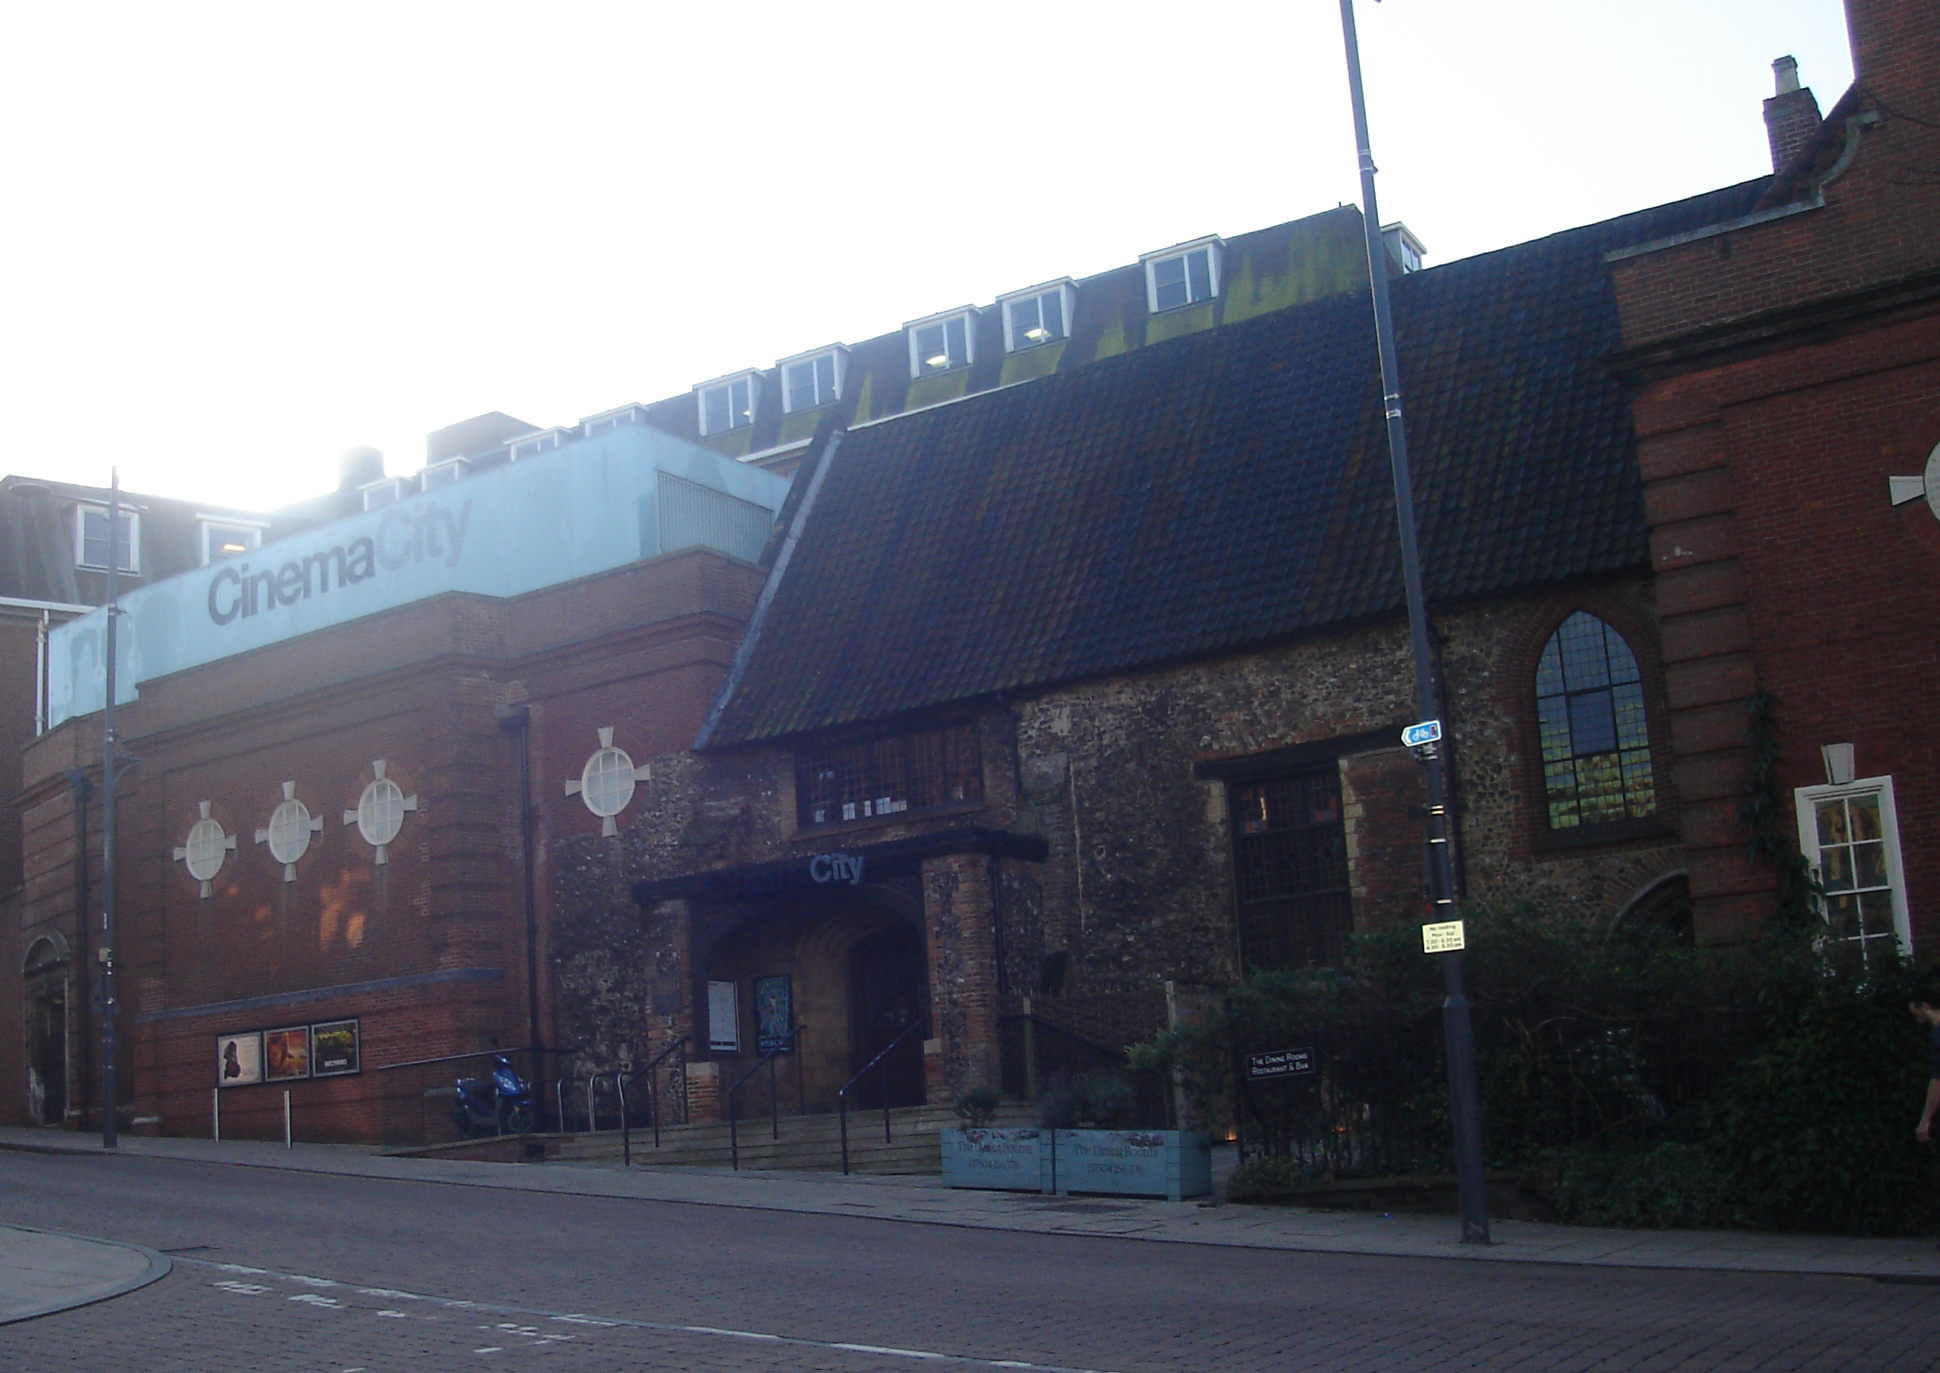 Cinema arts bay city